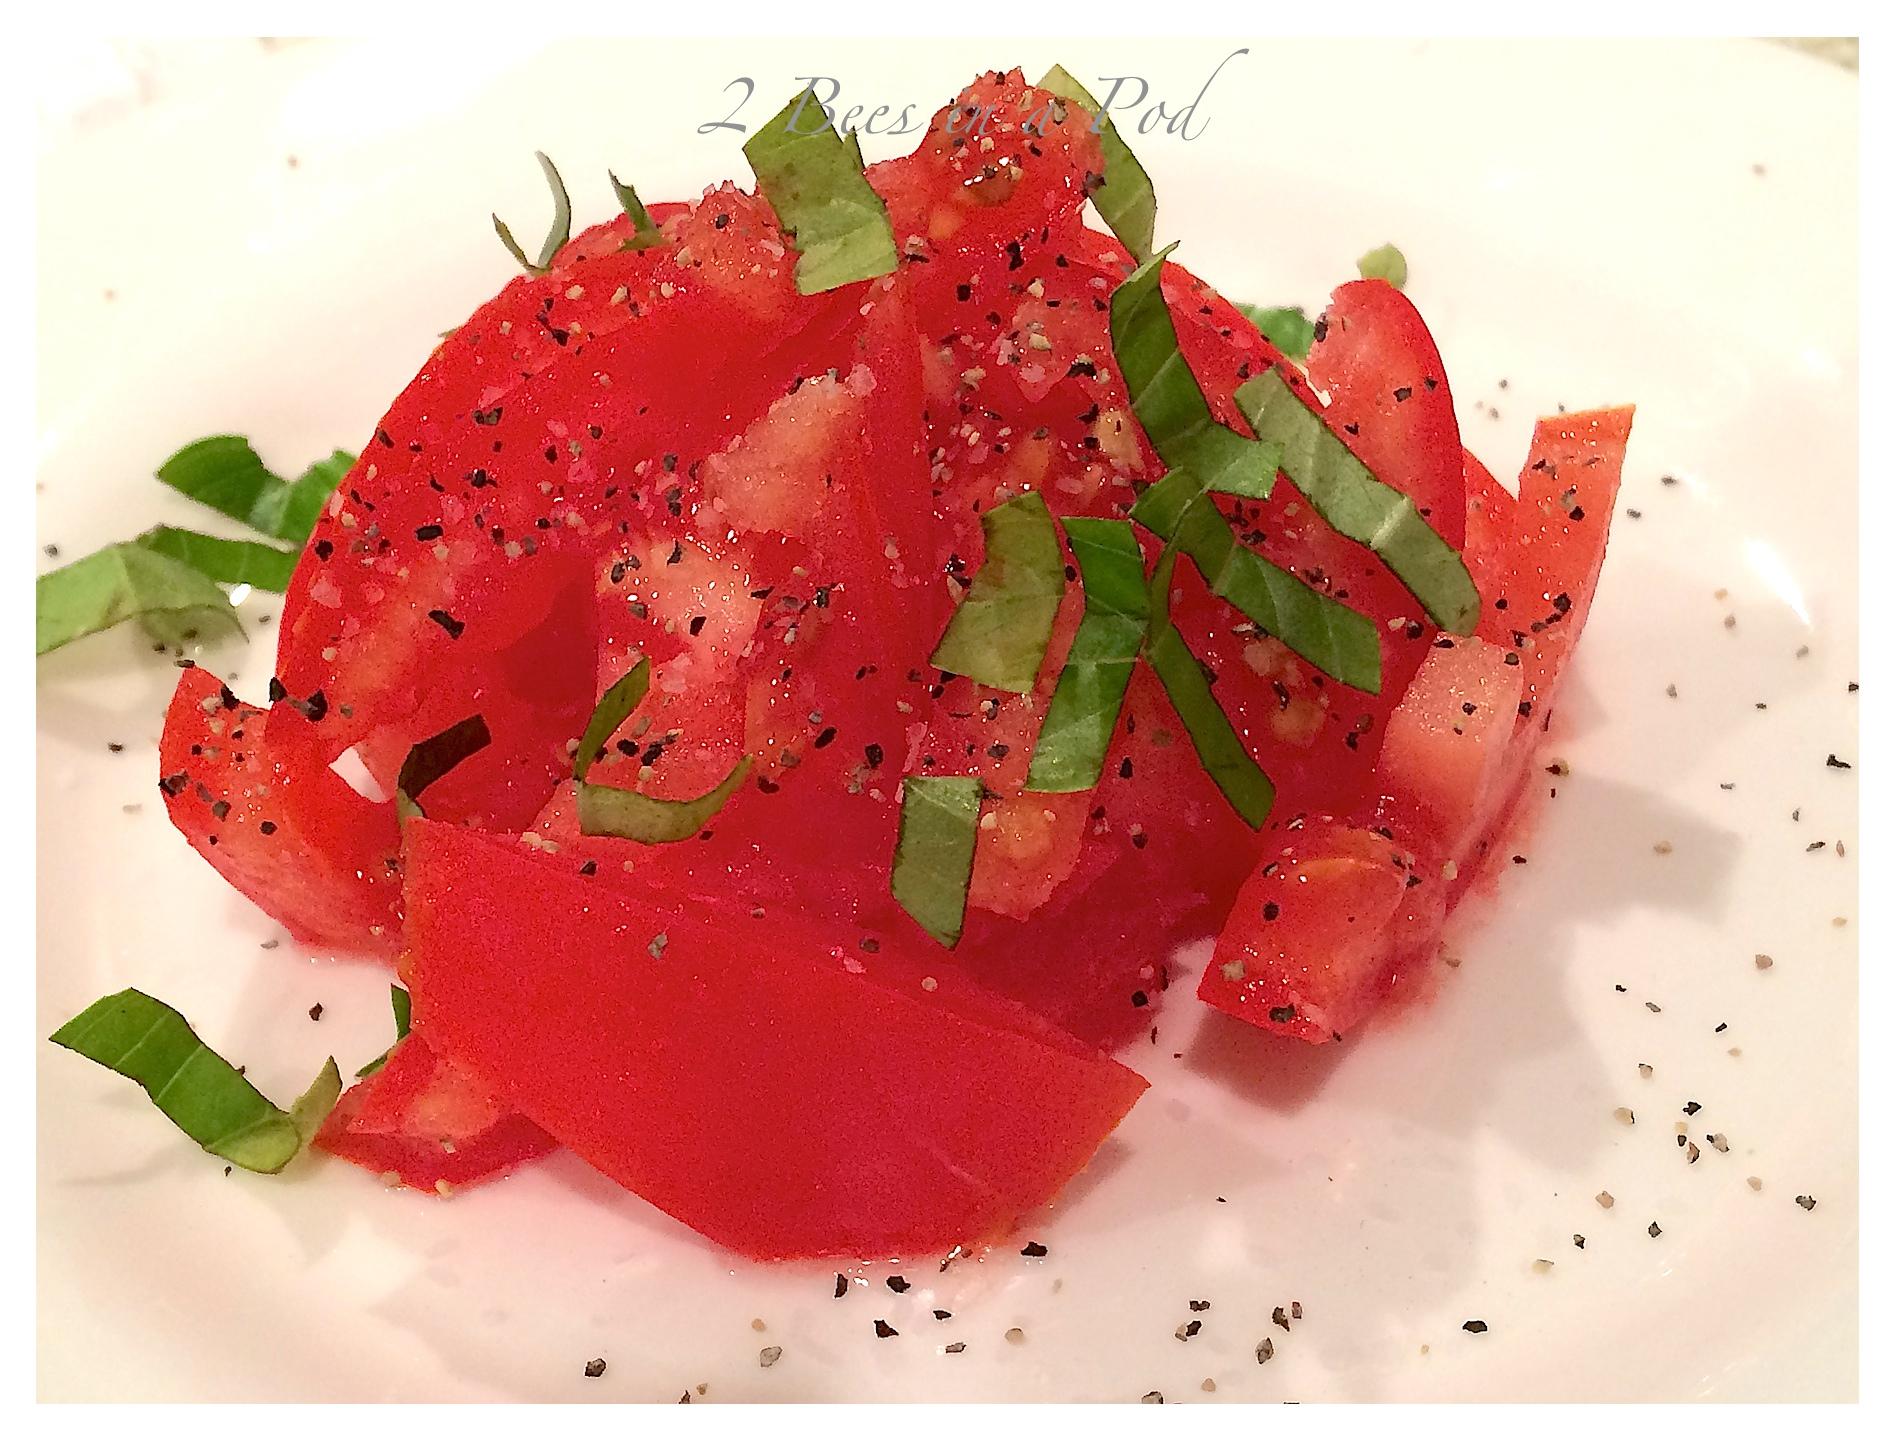 Recipe for creamy Italian dressing. Love the red wine vinegar and garlic flavor!